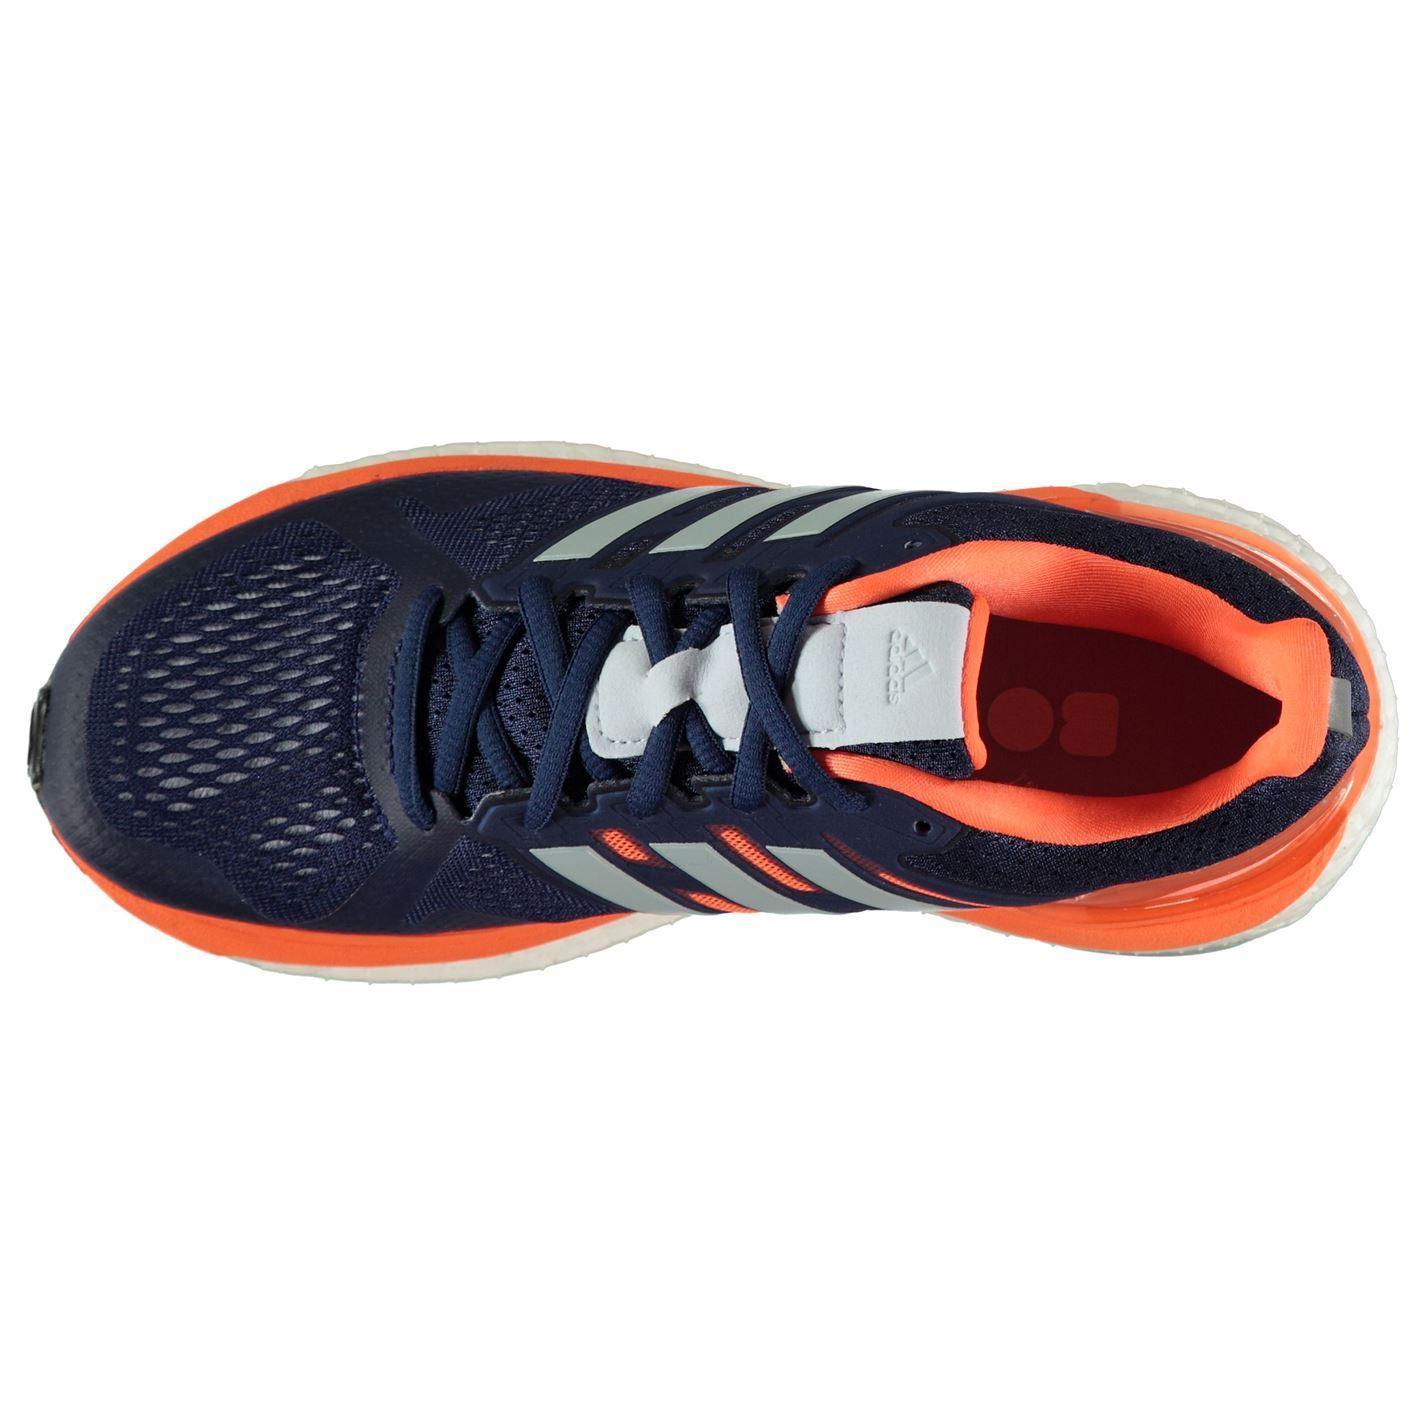 adidas Women's Supernova ST Running Shoes